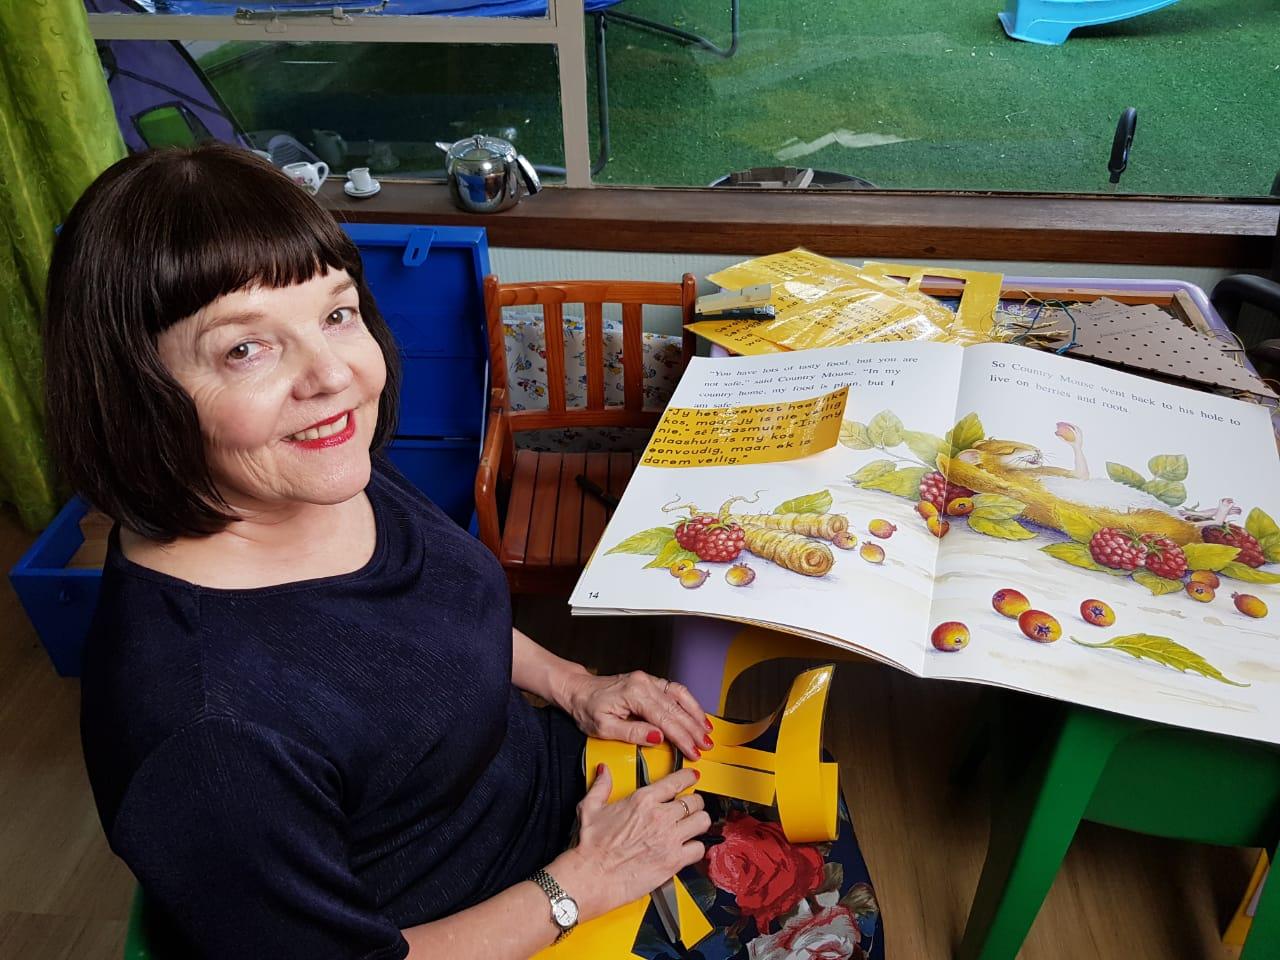 Annekie Pretorius